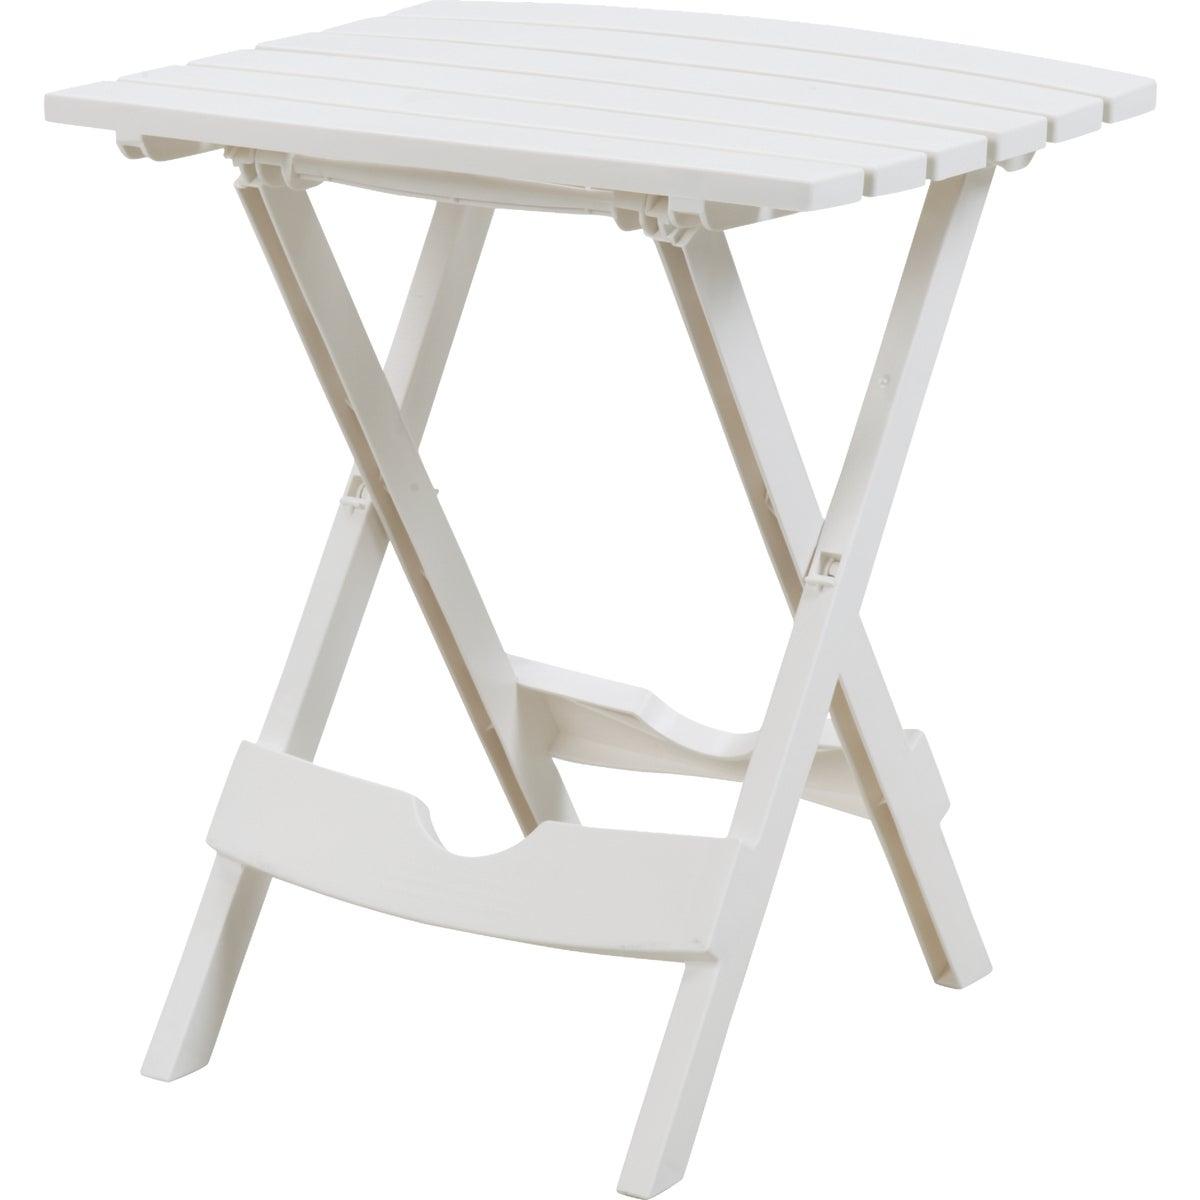 WHITE QUIK FOLD TABLE - 8500-48-3731 by Adams Mfg Patio Furn